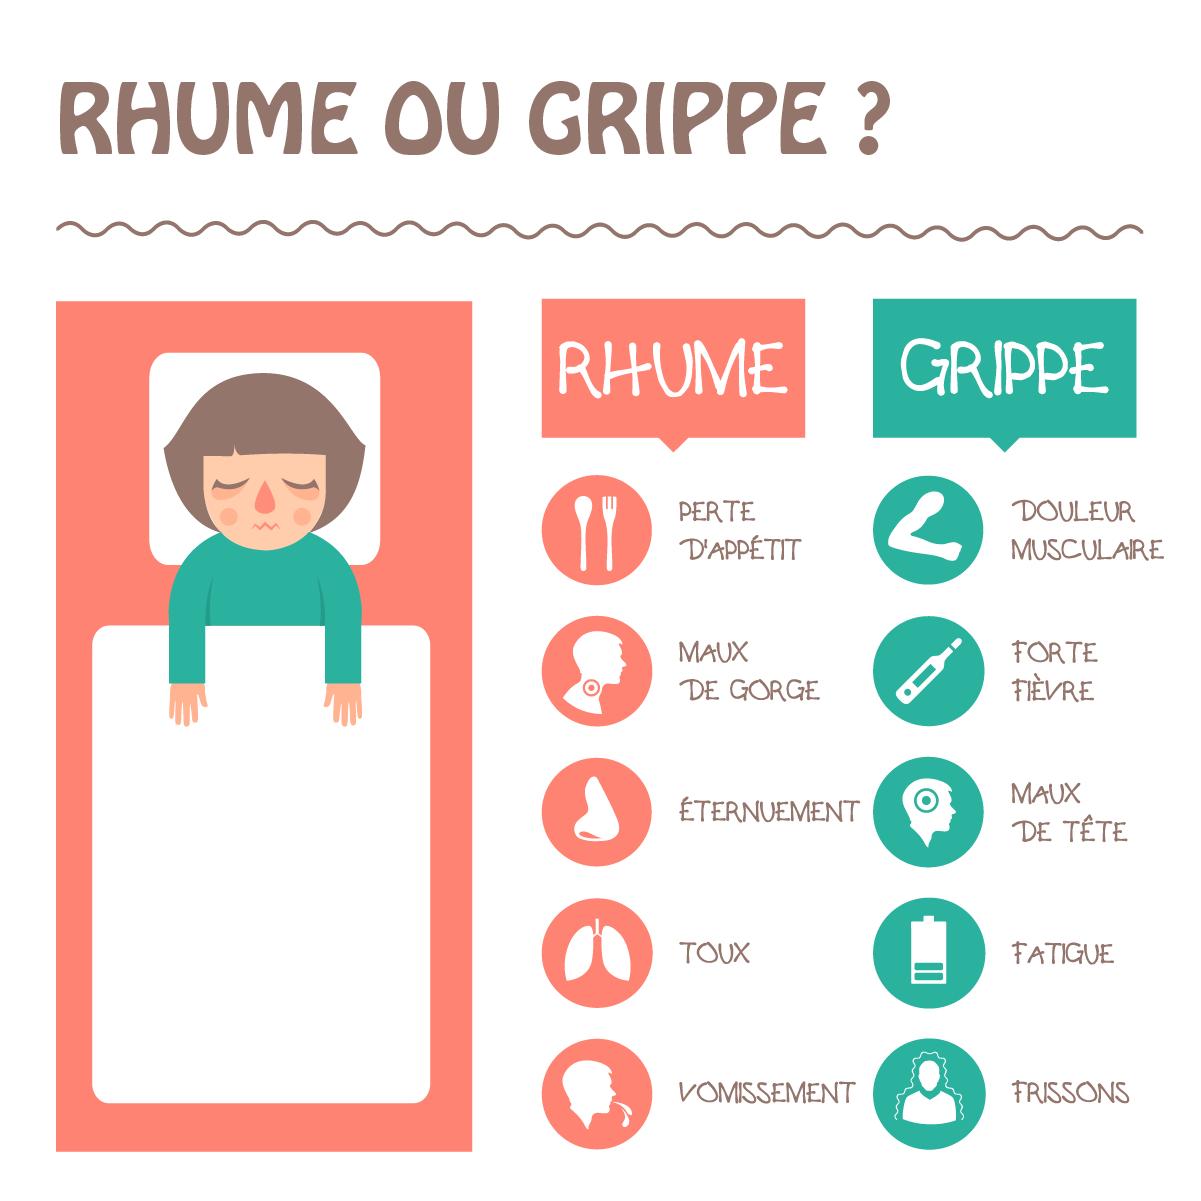 Rhumeougrippe-01-01